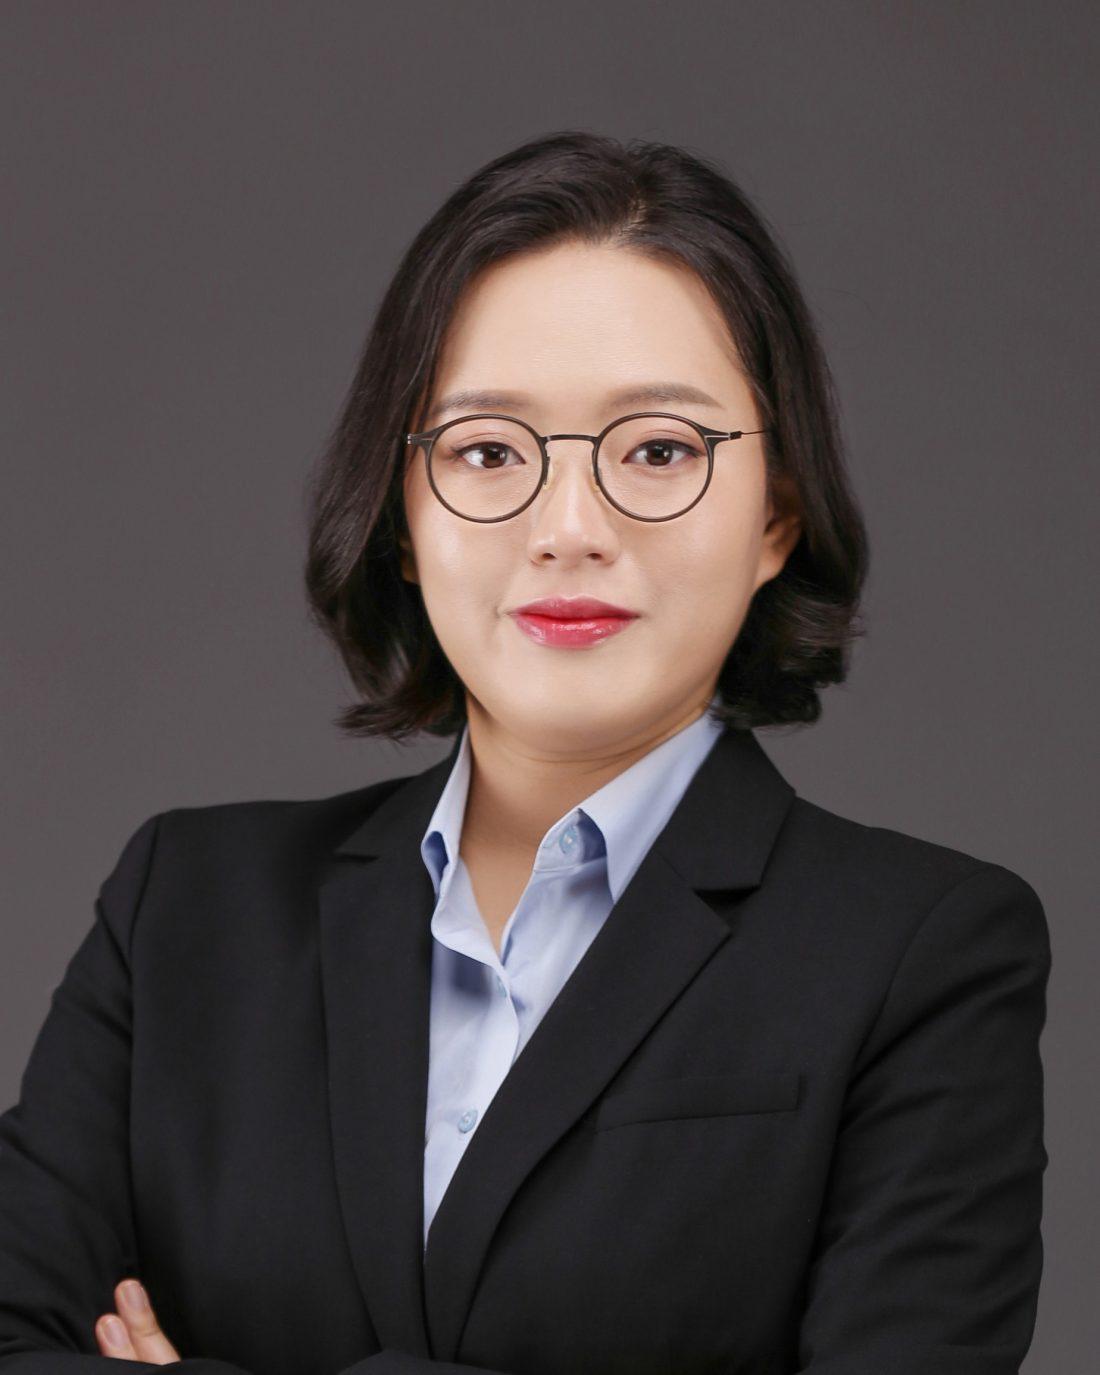 Headshot of Jane Kim